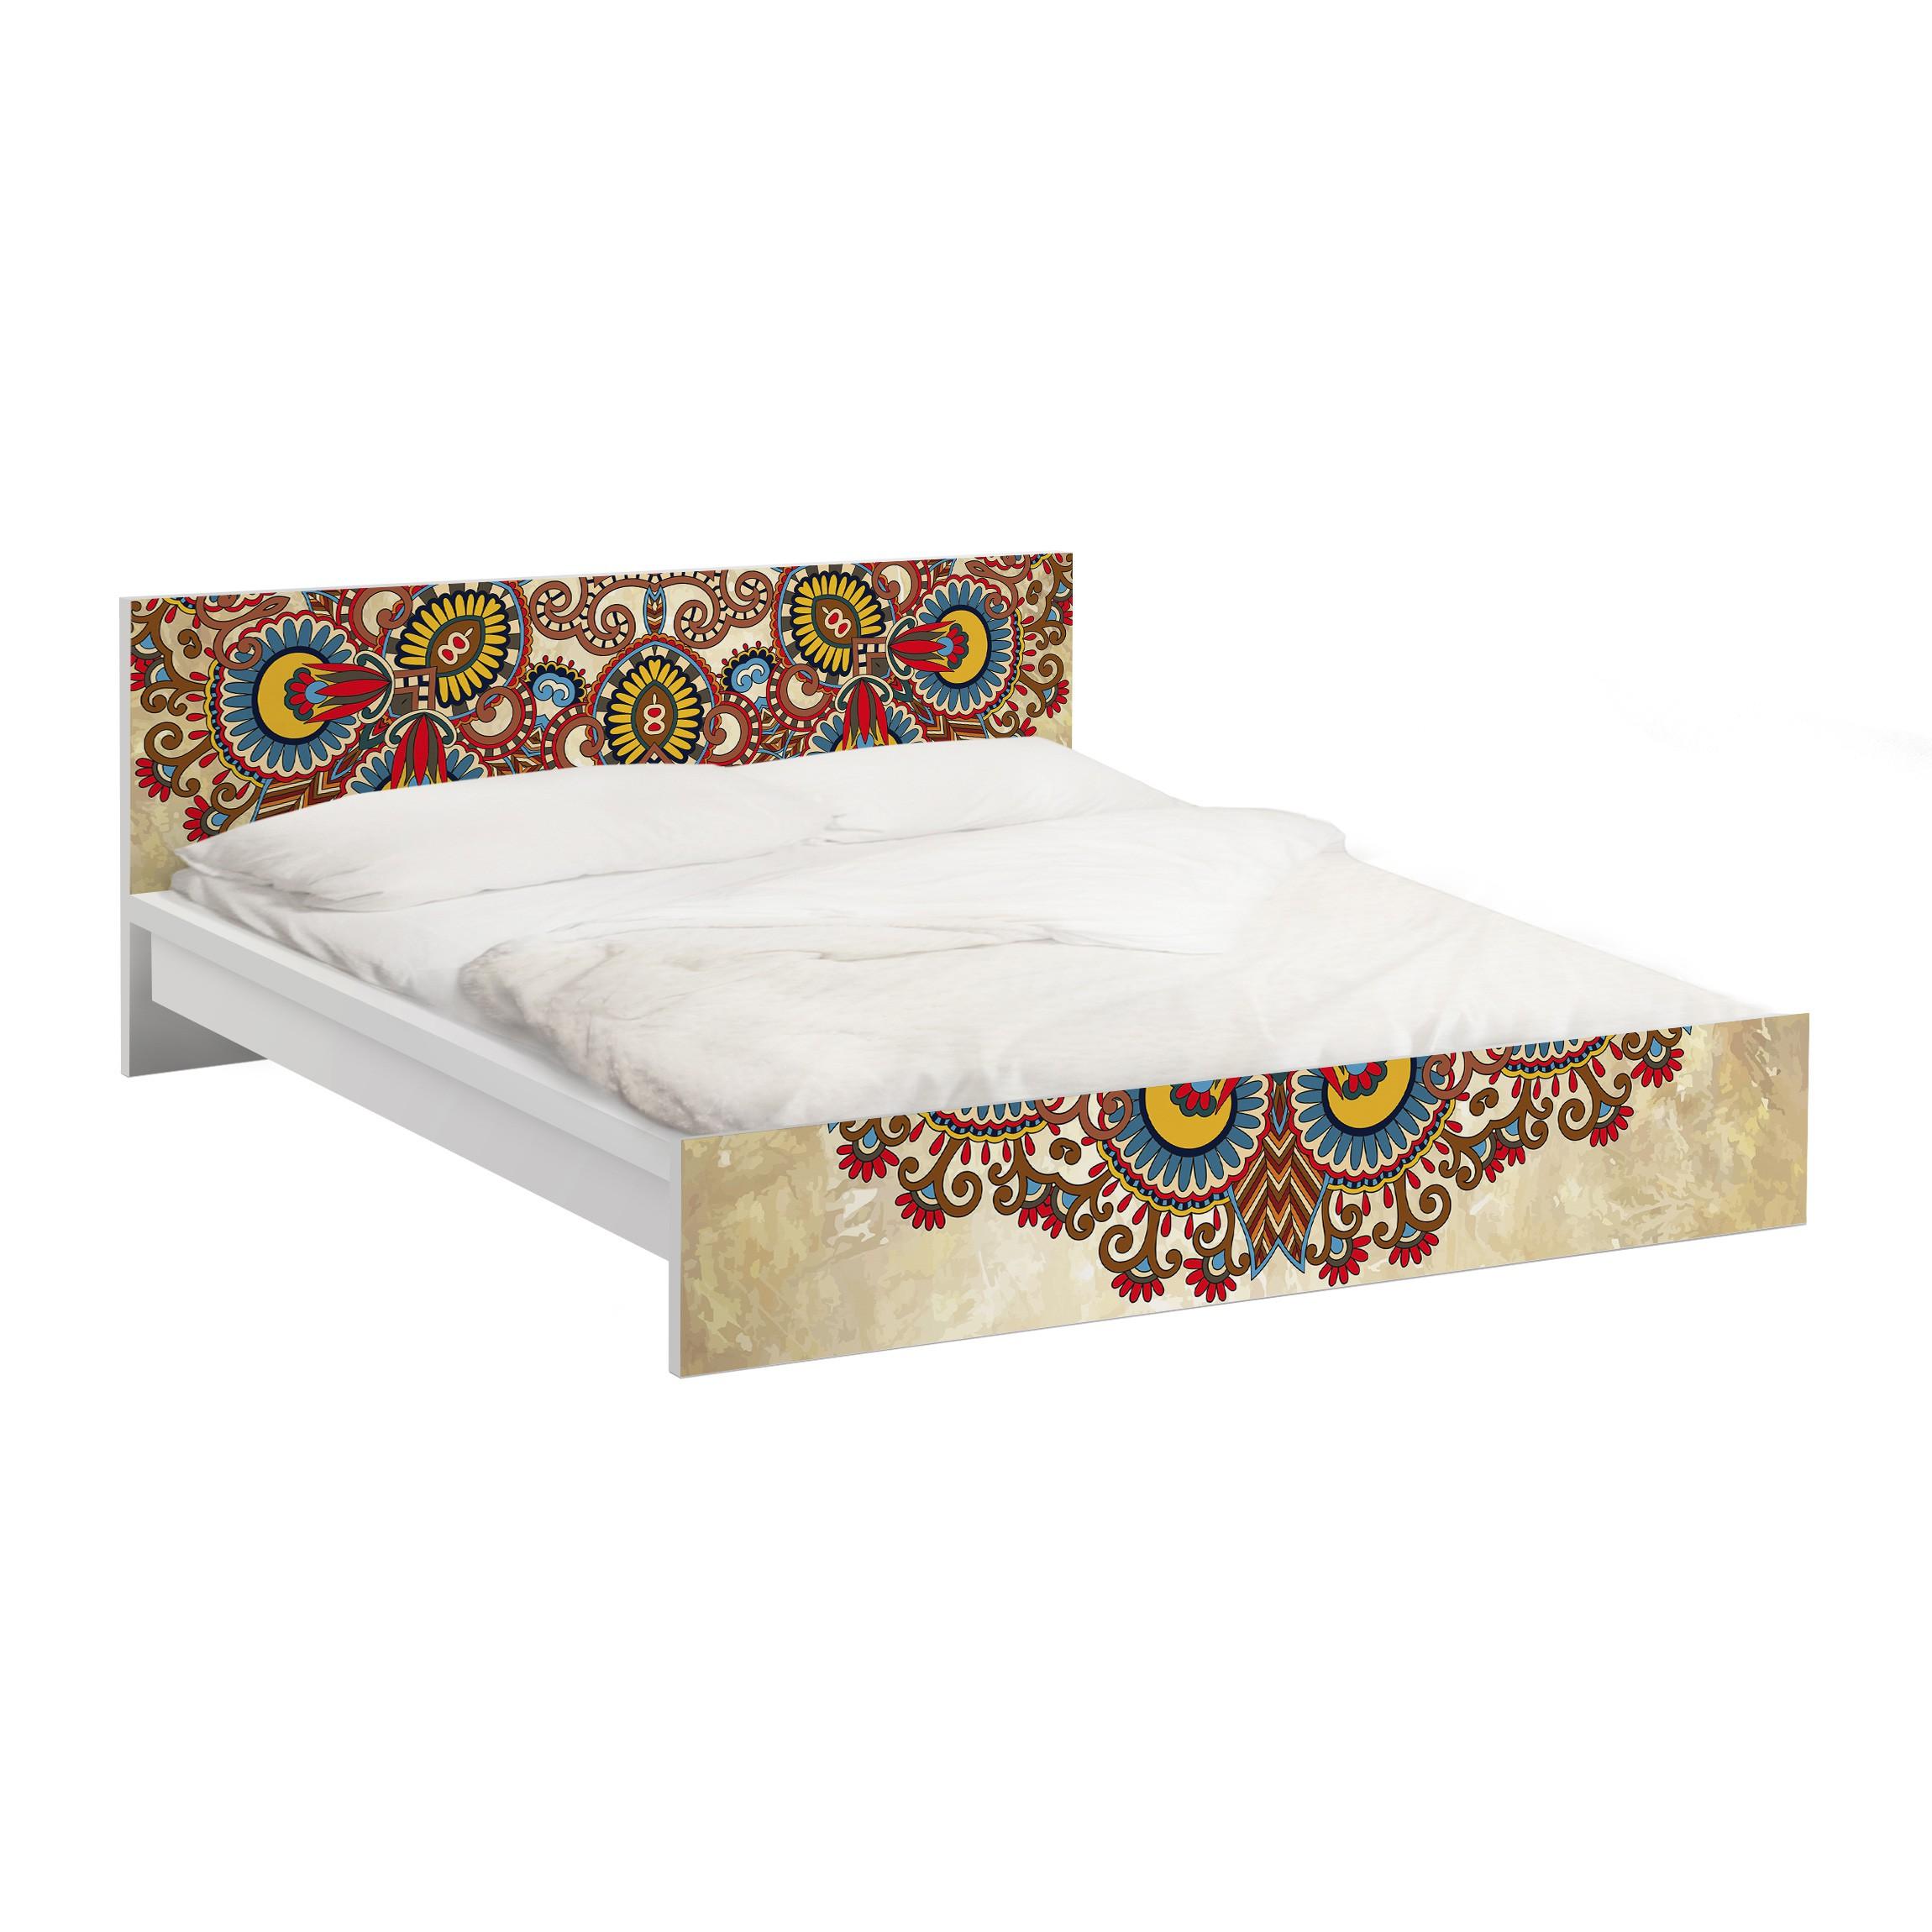 Carta adesiva per mobili ikea malm letto basso 160x200cm coloured mandala - Mobili letto ikea ...